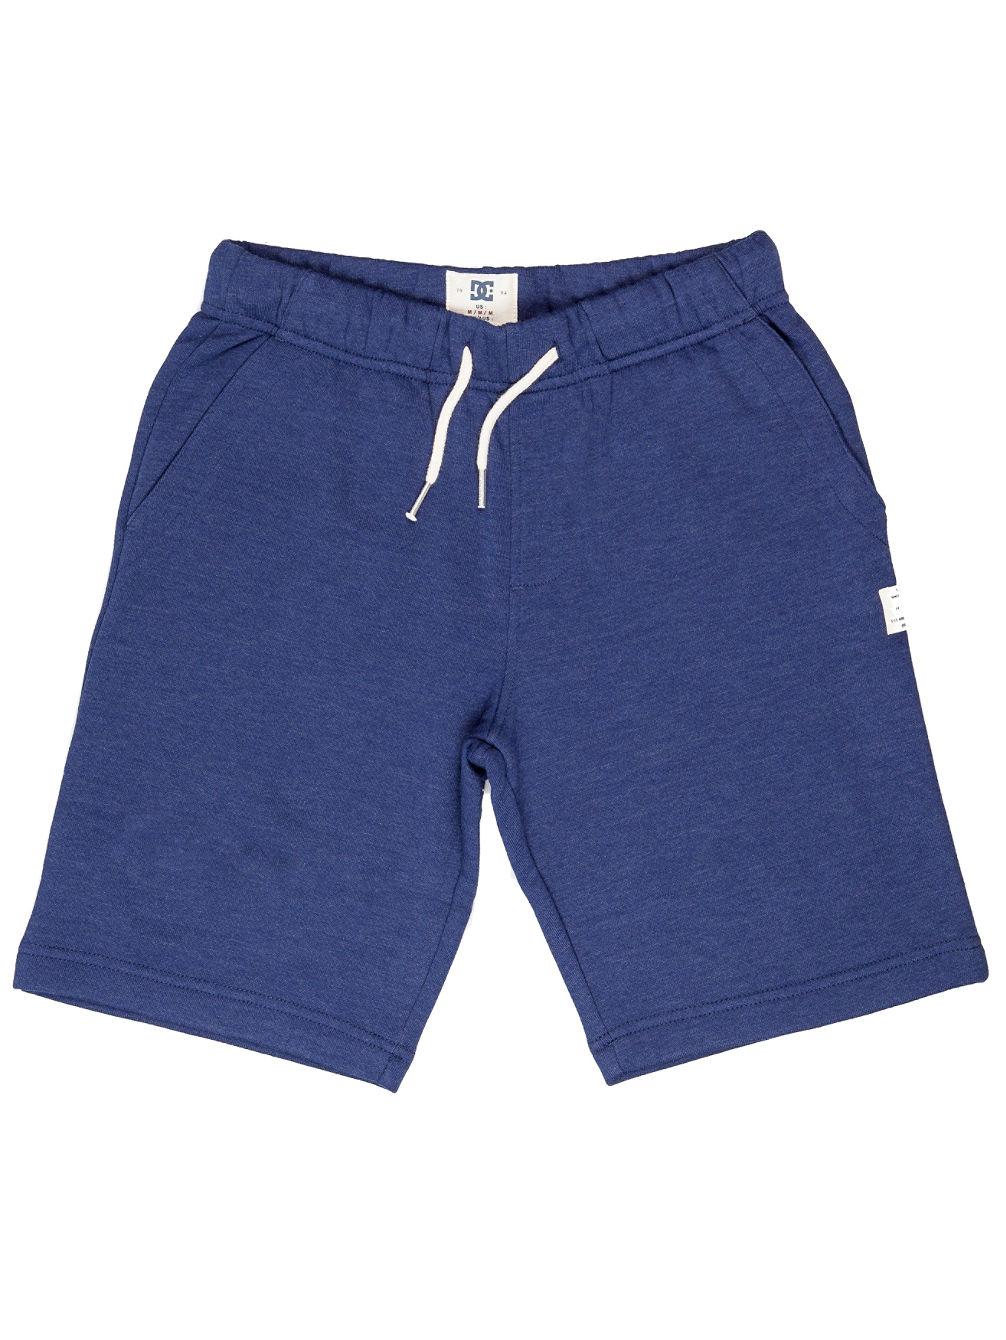 dc-rebel-shorts-boys